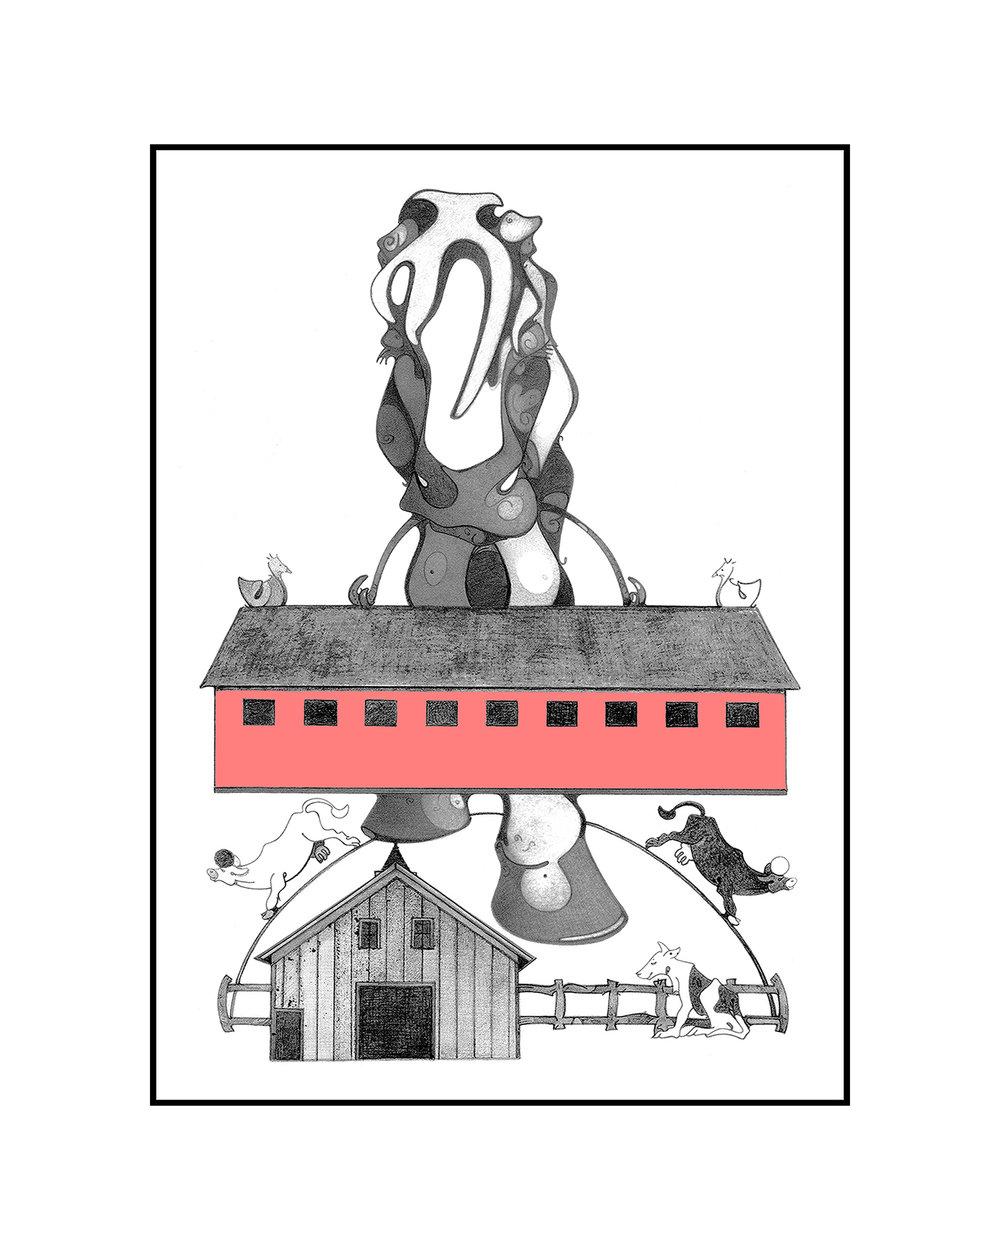 Horse Barn Hill, digital archival, printed at Zimmerman Fine Art Studio,artwork & copyright by Kathleen Zimmerman